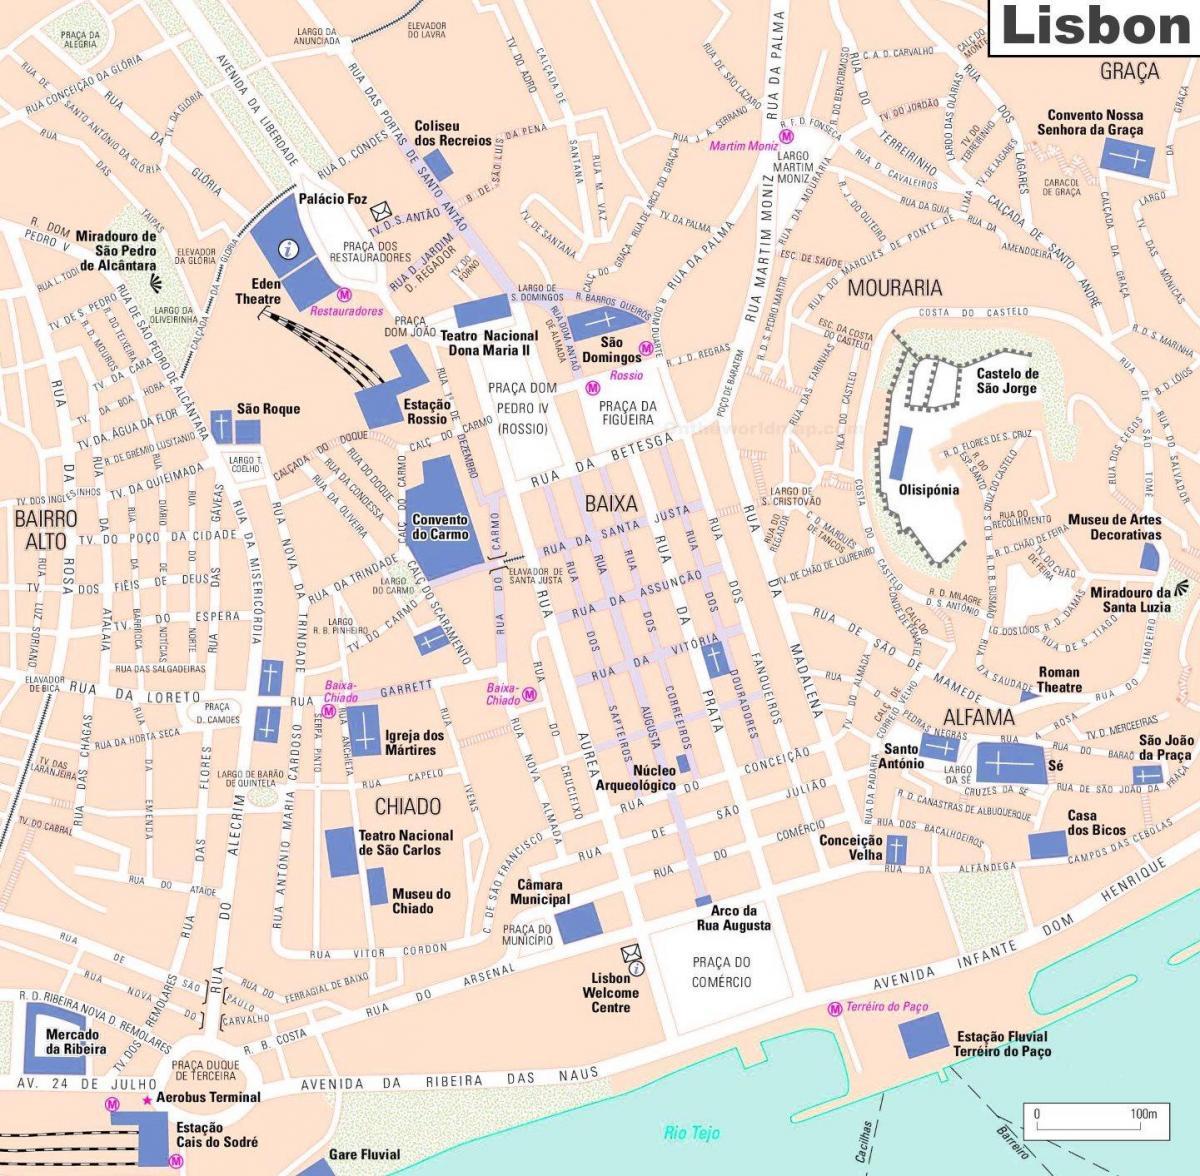 Baixa Lissabon-Karte - Map-baixa in Lissabon (Portugal) on